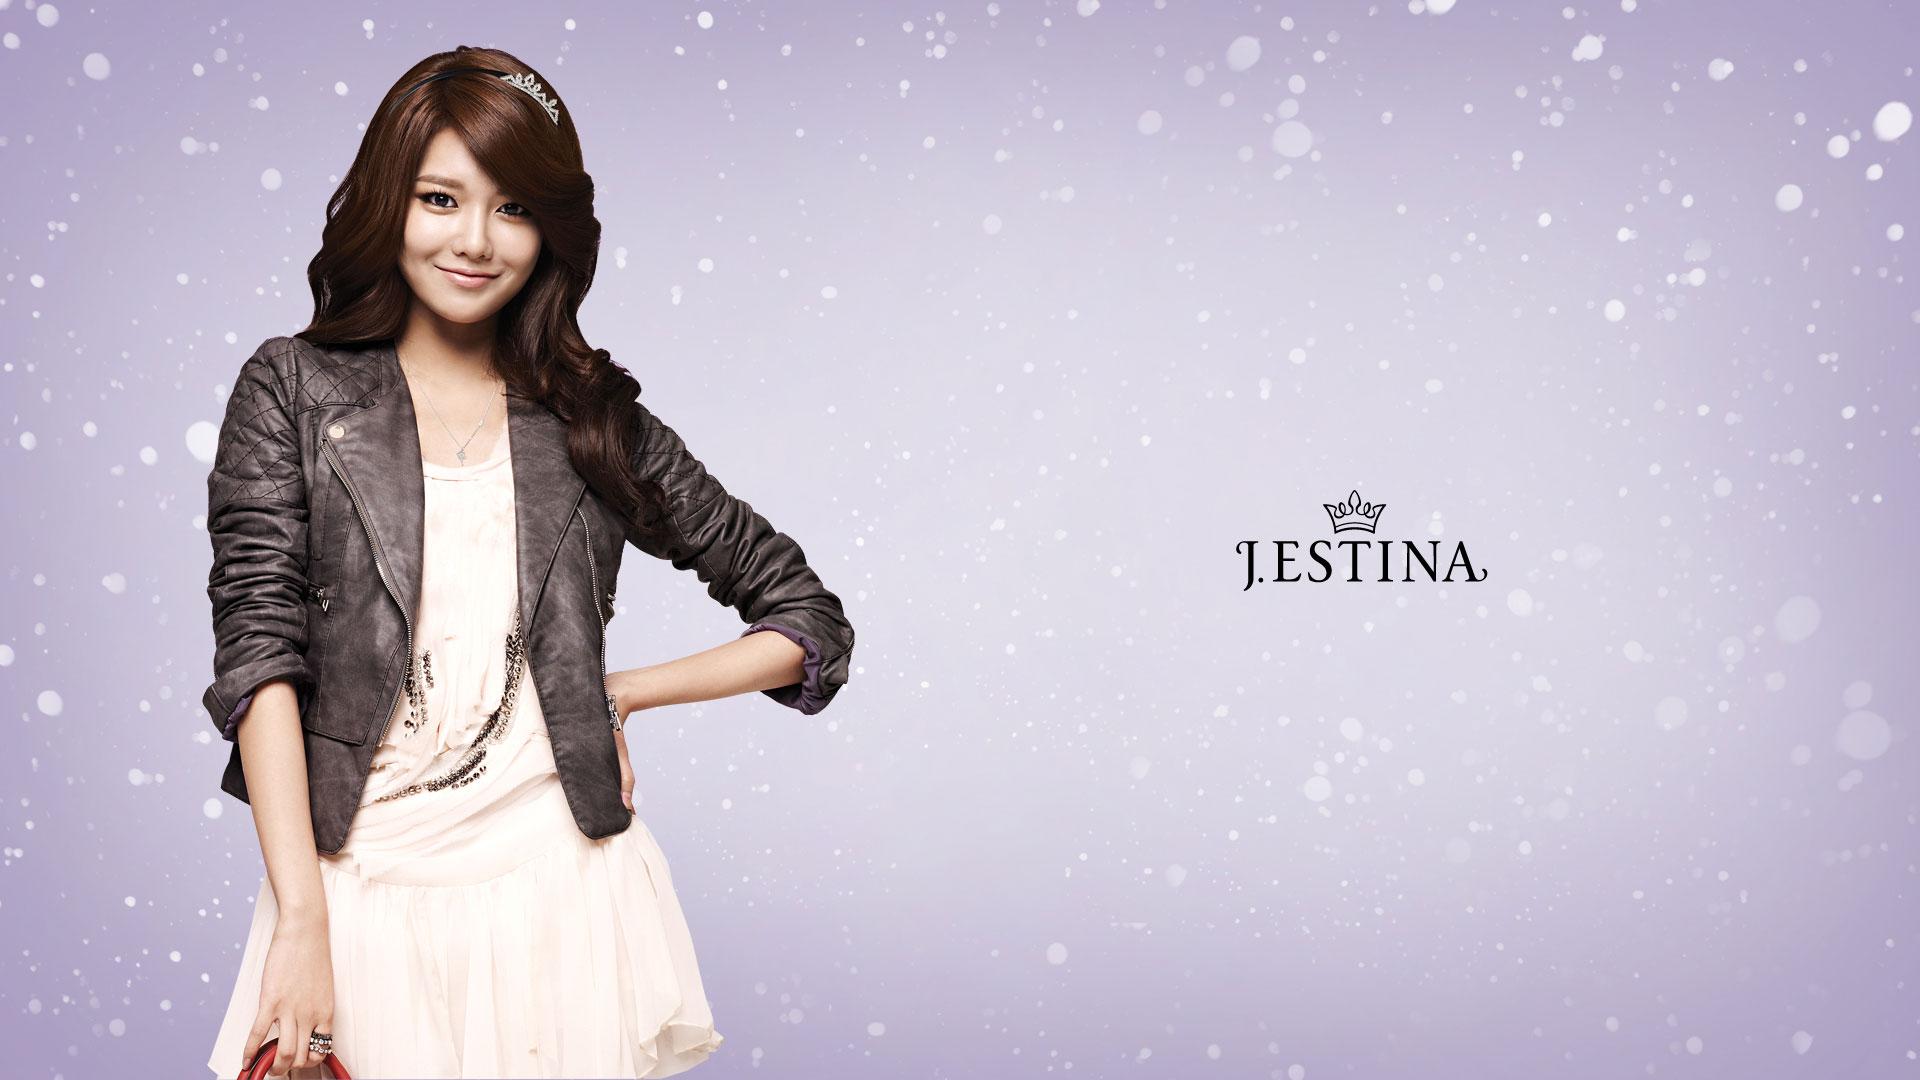 Hd Wallpaper Japanese Girl Girls Generation J Estina Wallpapers